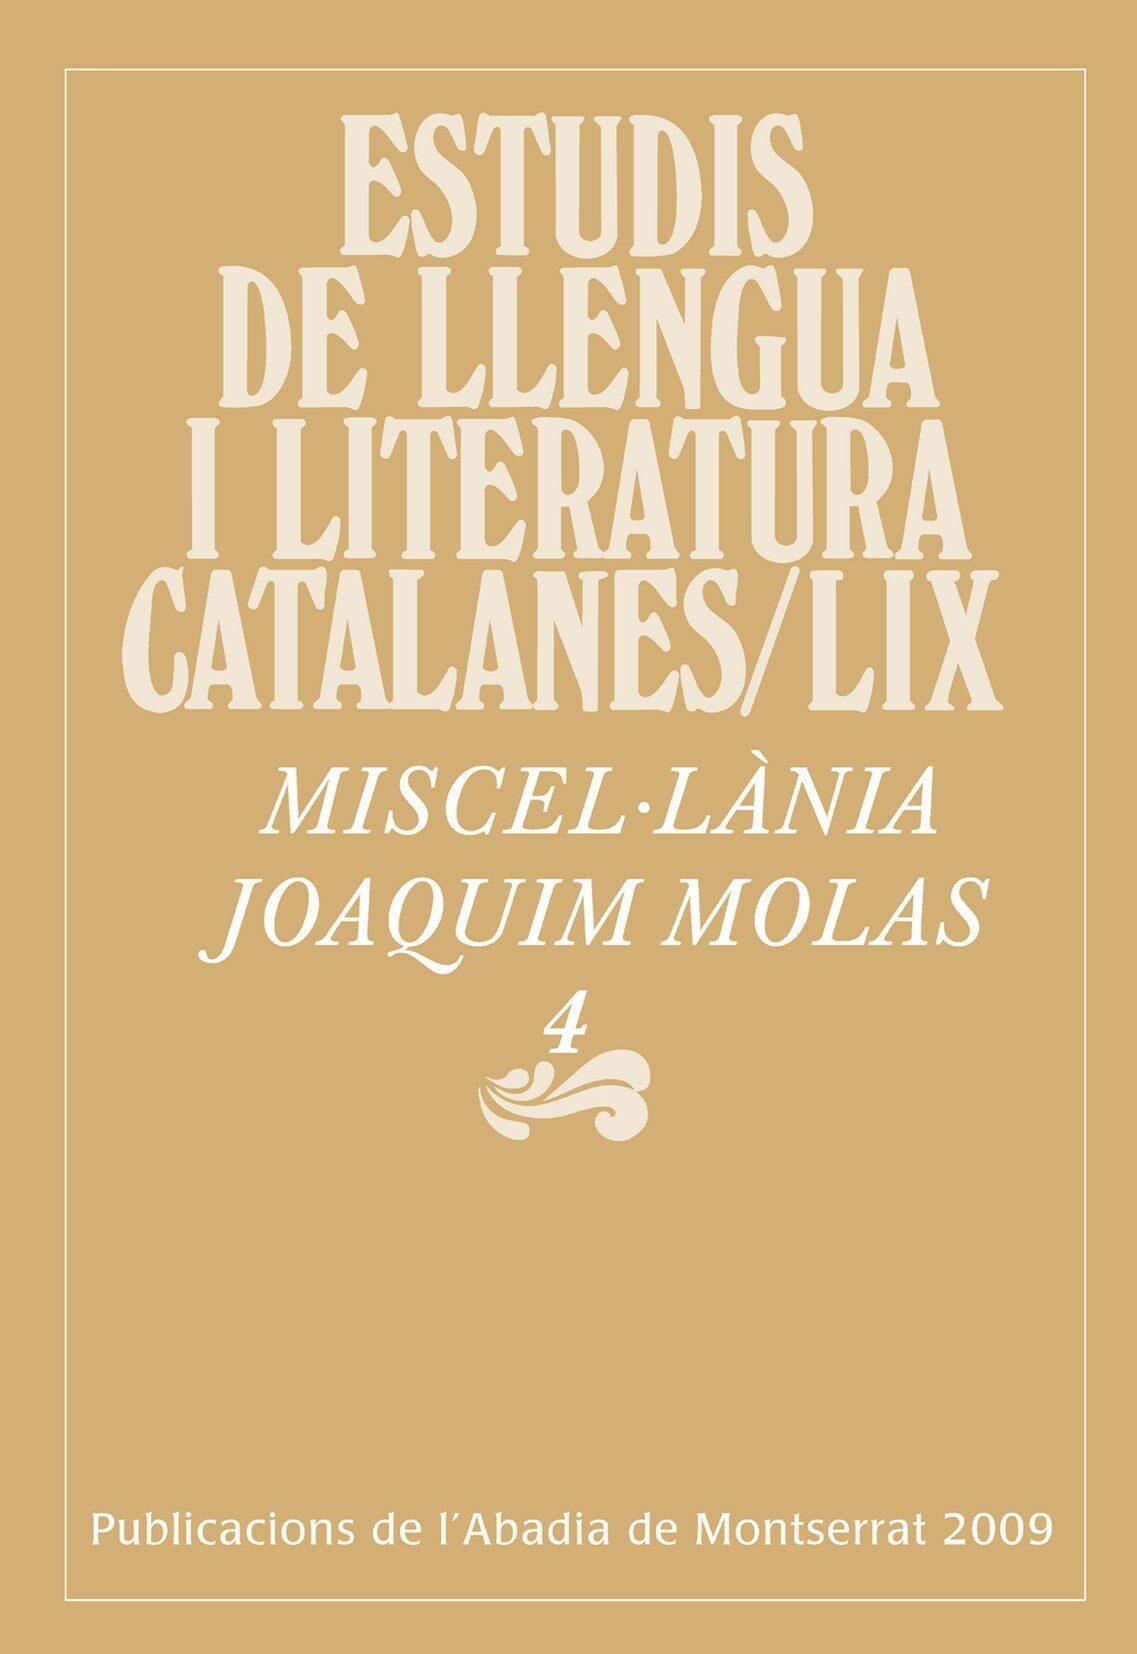 Miscel.lania Jaoquim Molas por Vv.aa.